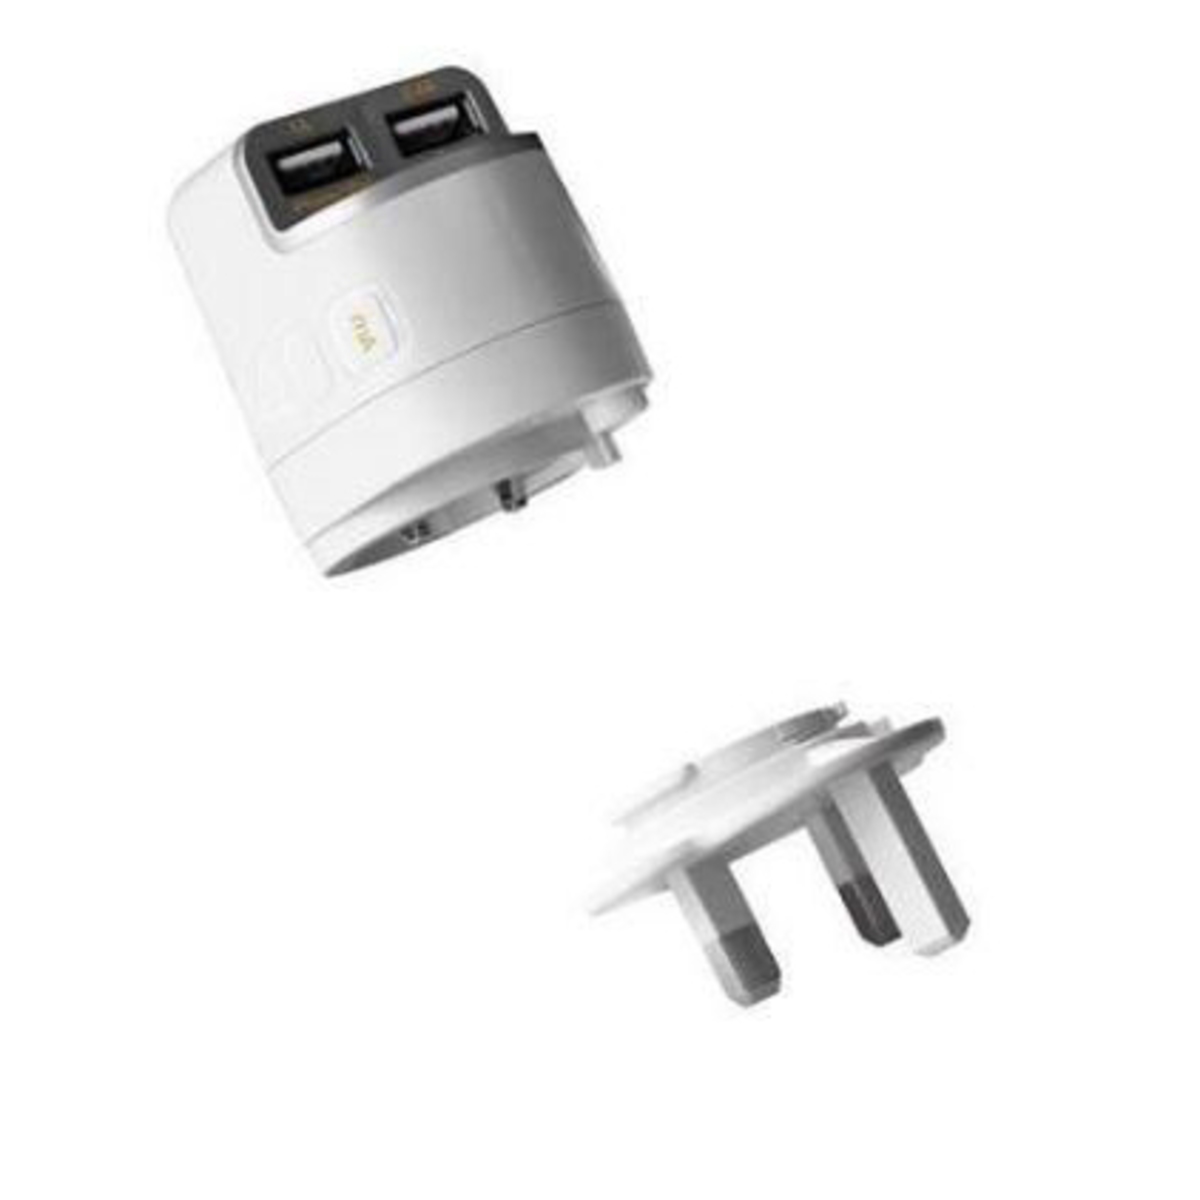 unplug - TC3400 Universal Powerful Dual USB 5V 2 Charger (Warranty Period 1 years)